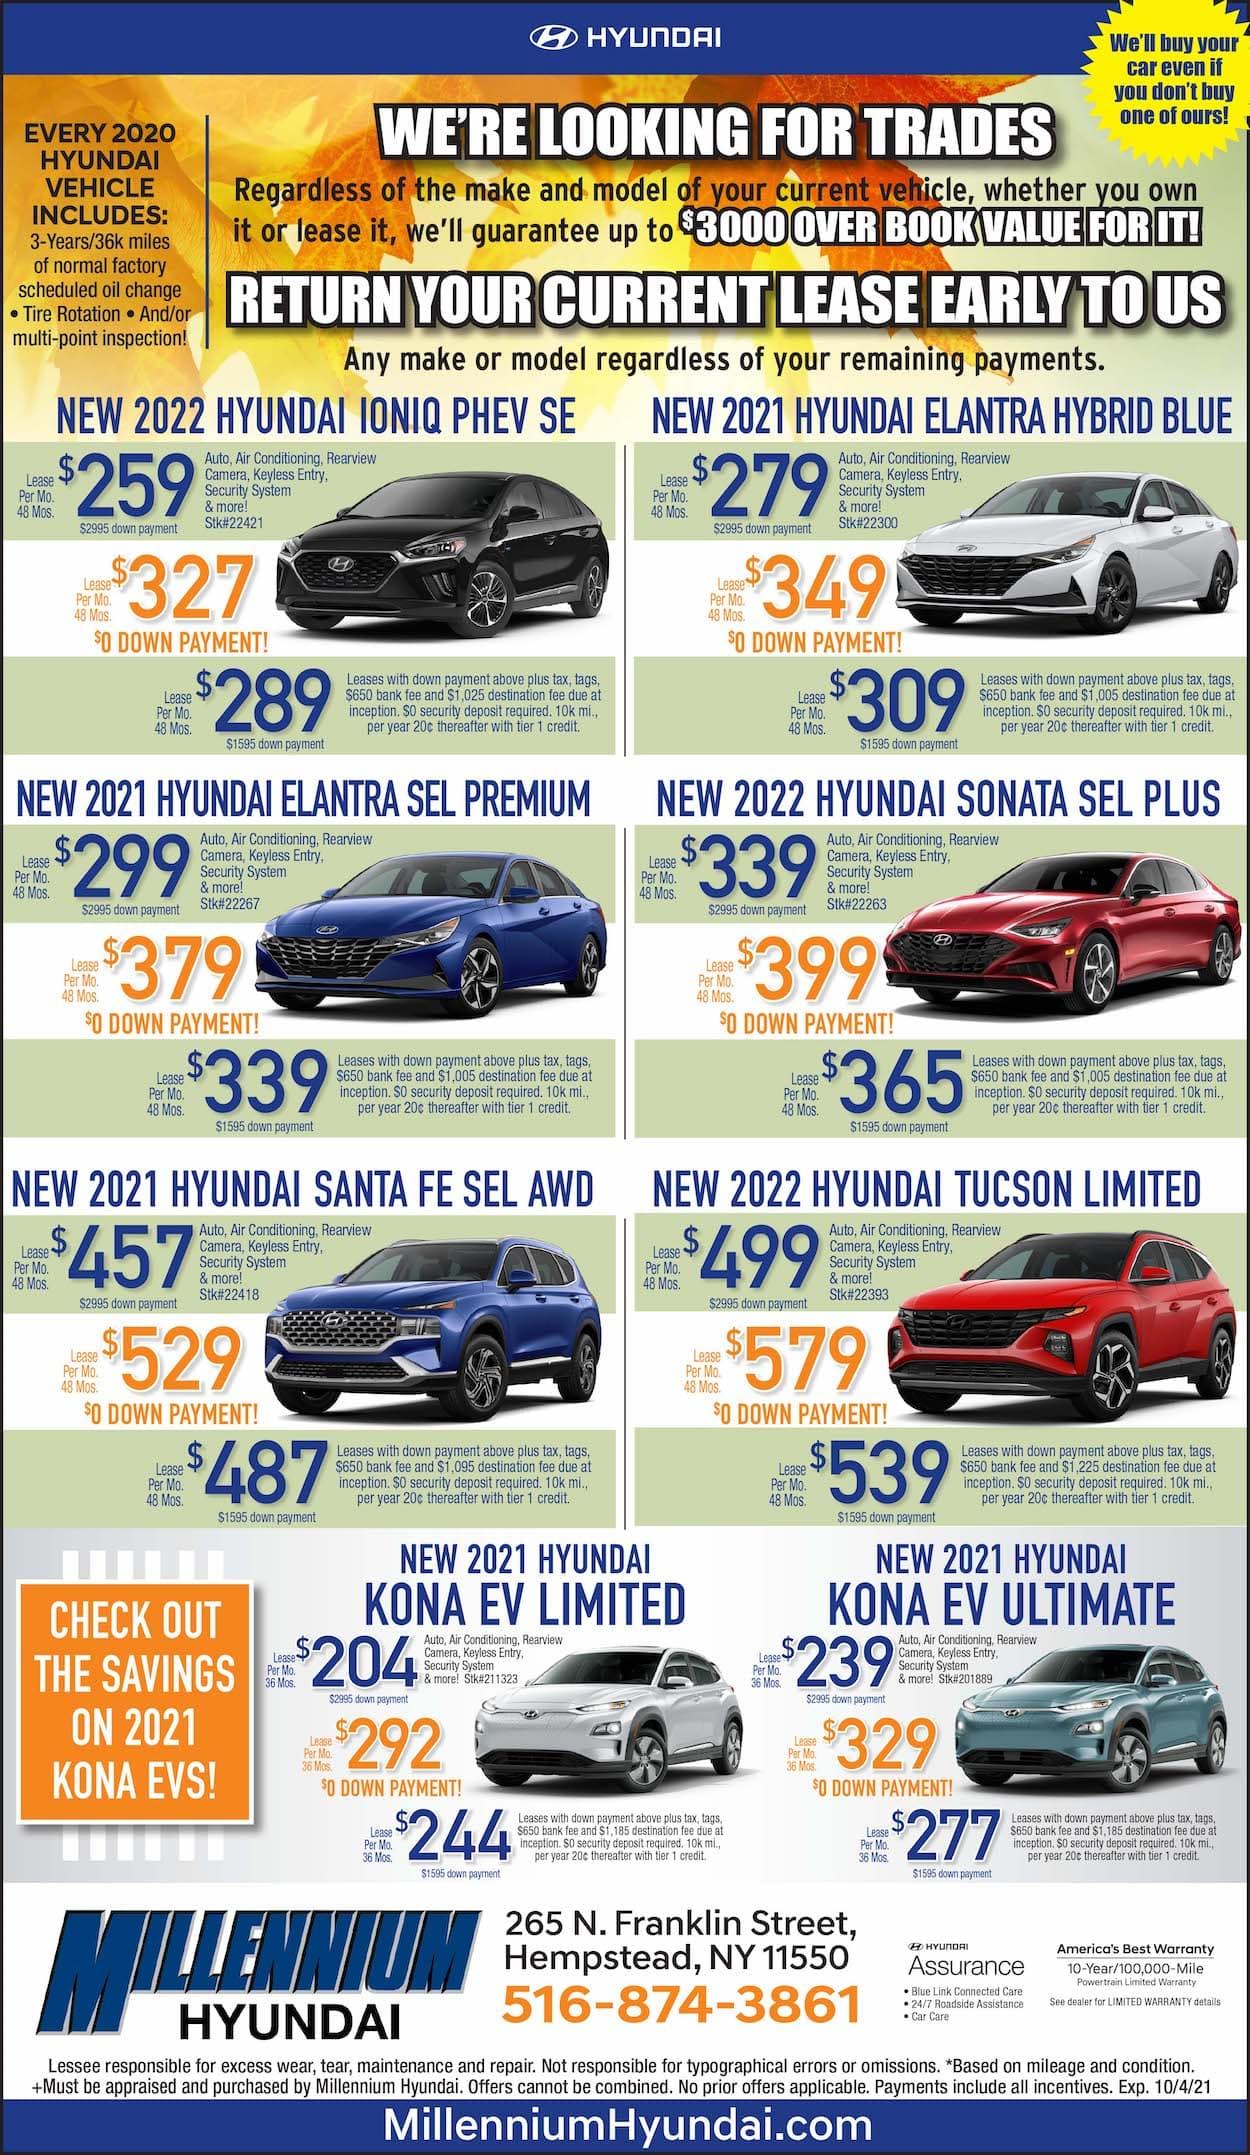 Millennium Hyundai Lease Offers